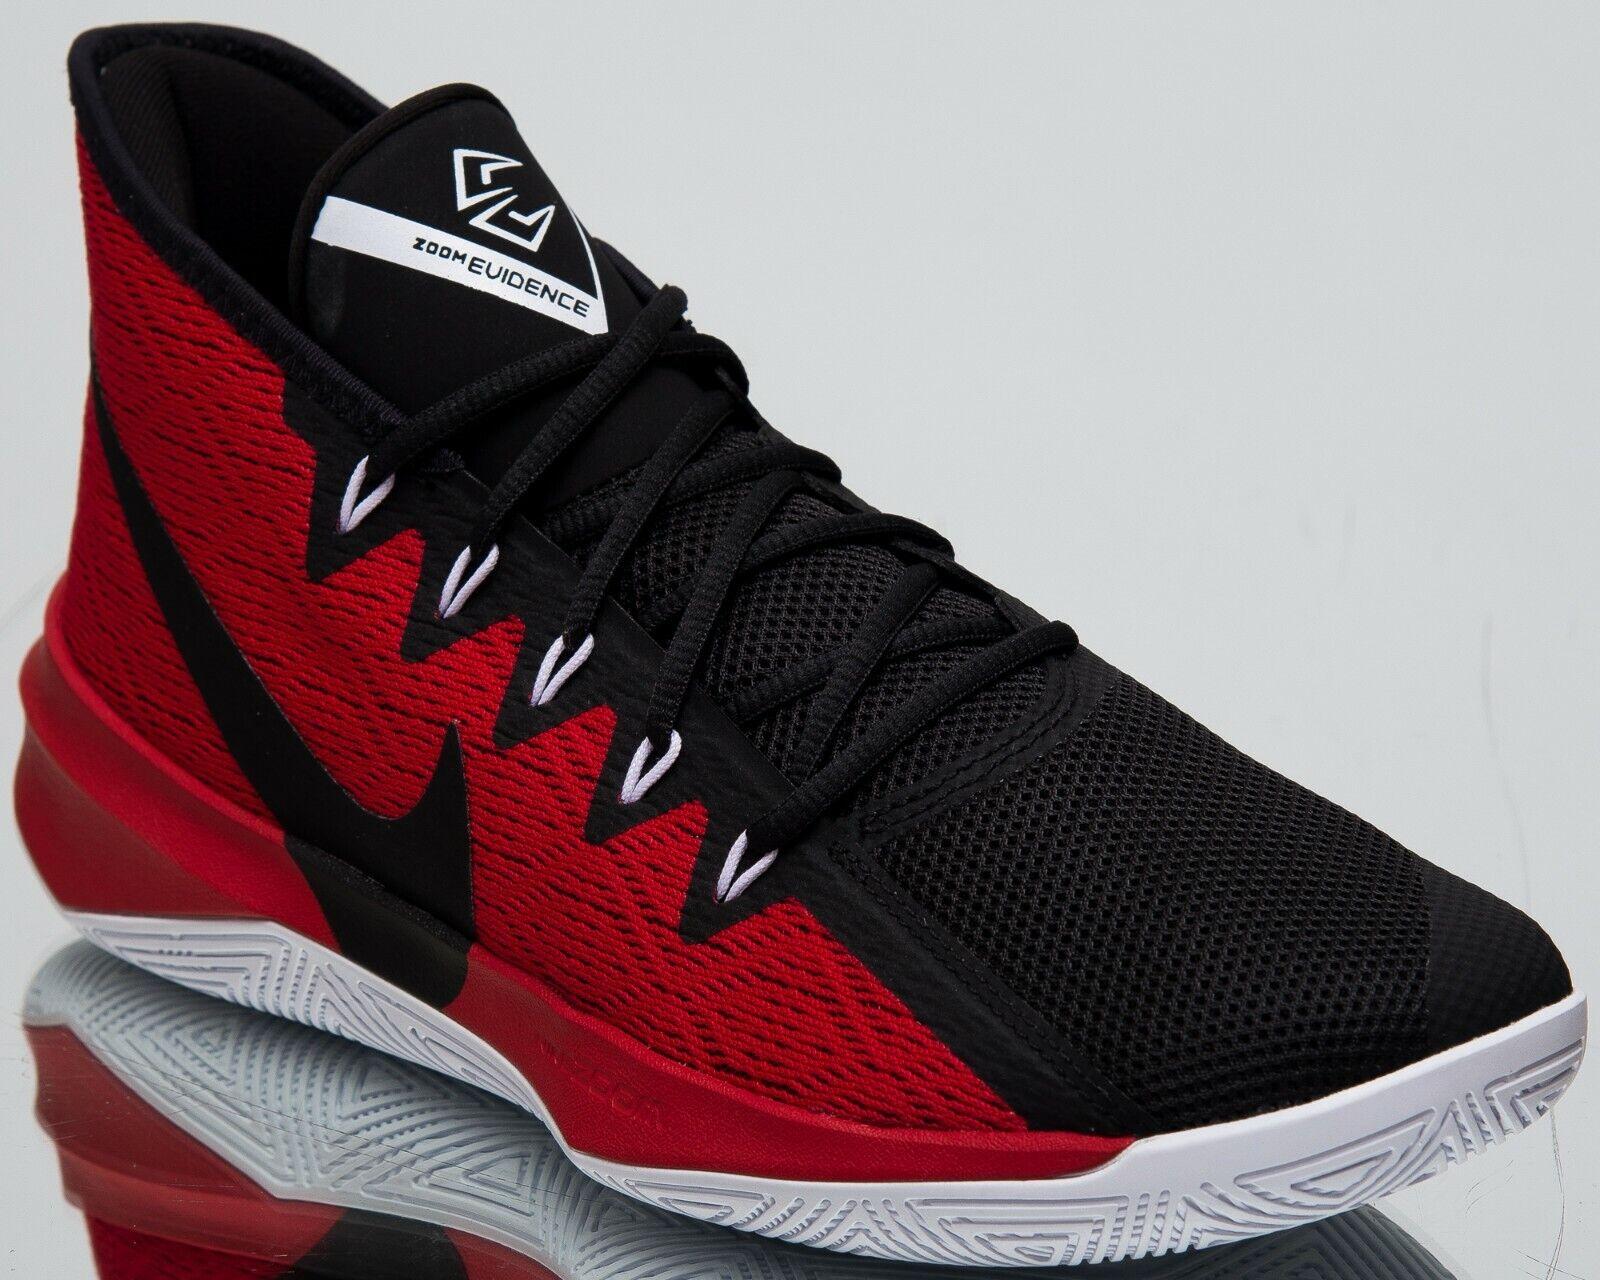 Nike Zoom Evidence III New Mens Basketball shoes Black University Red AJ5904-001